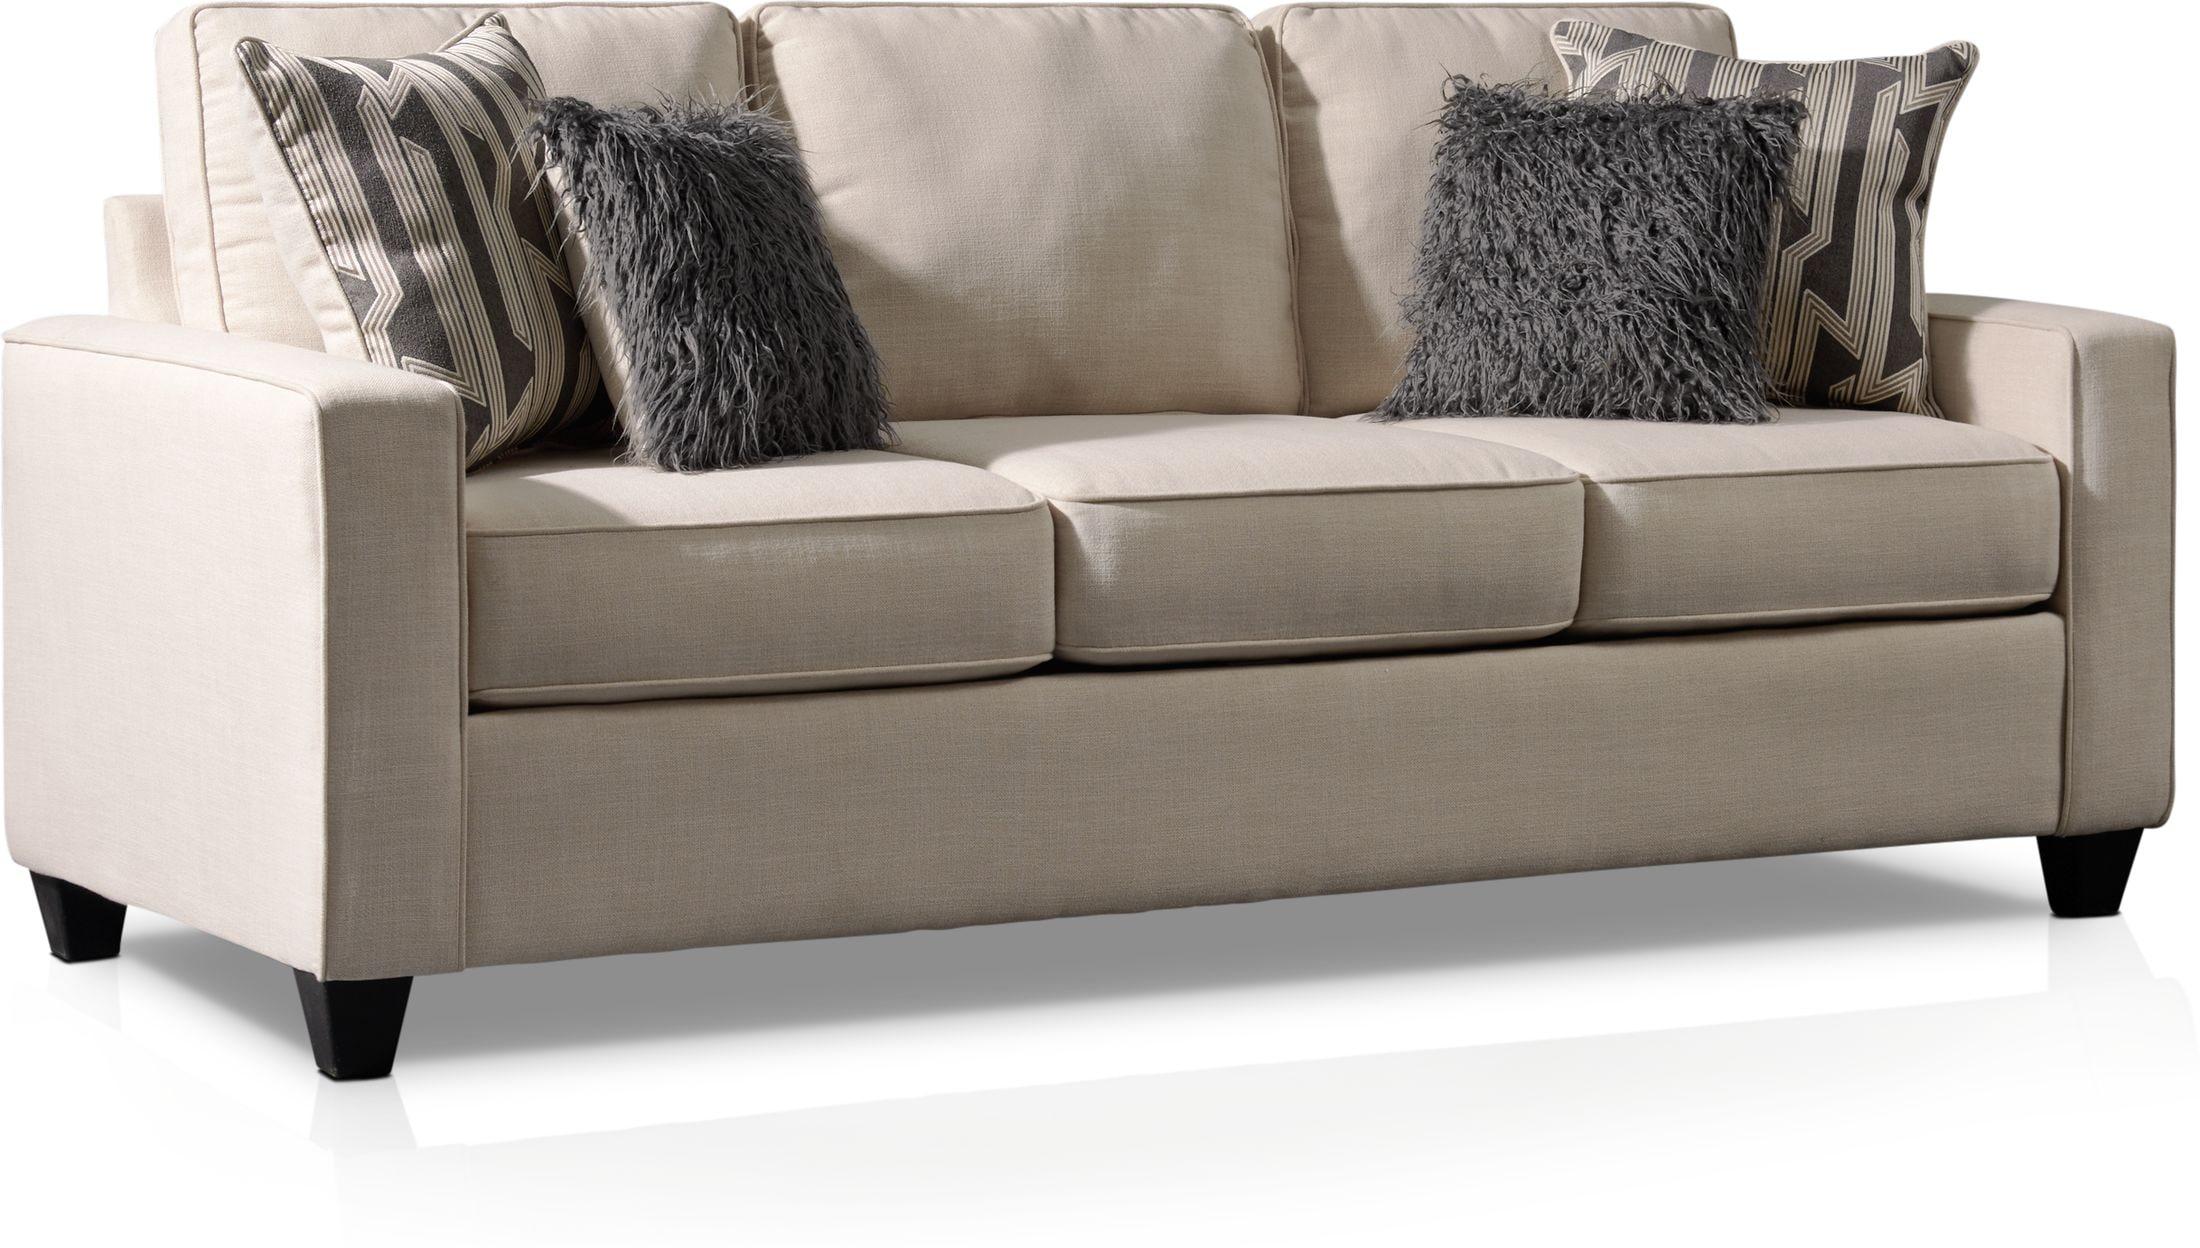 Living Room Furniture - Burton Sofa